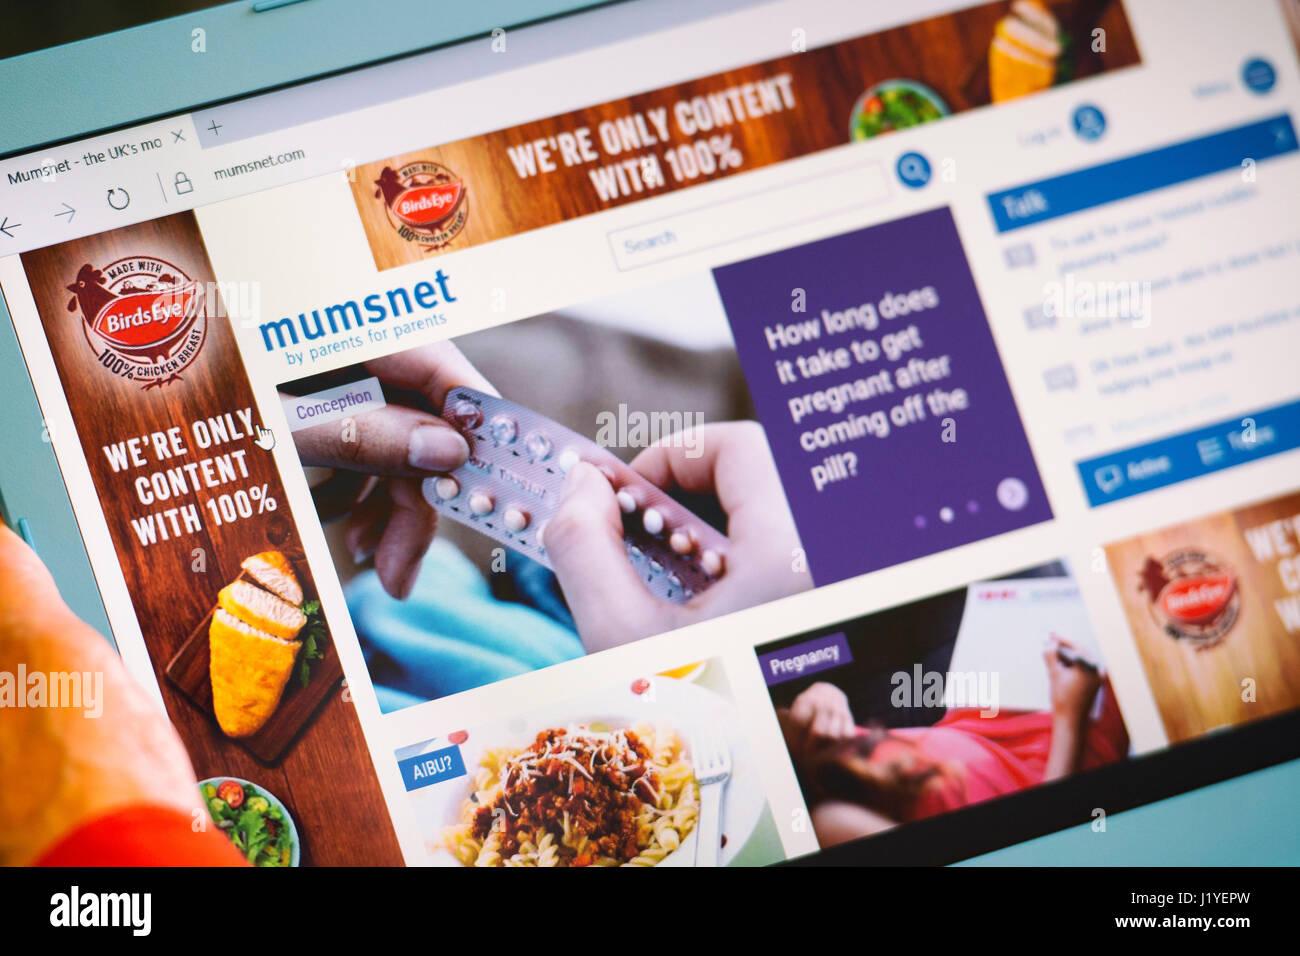 incontri siti Web Mumsnet